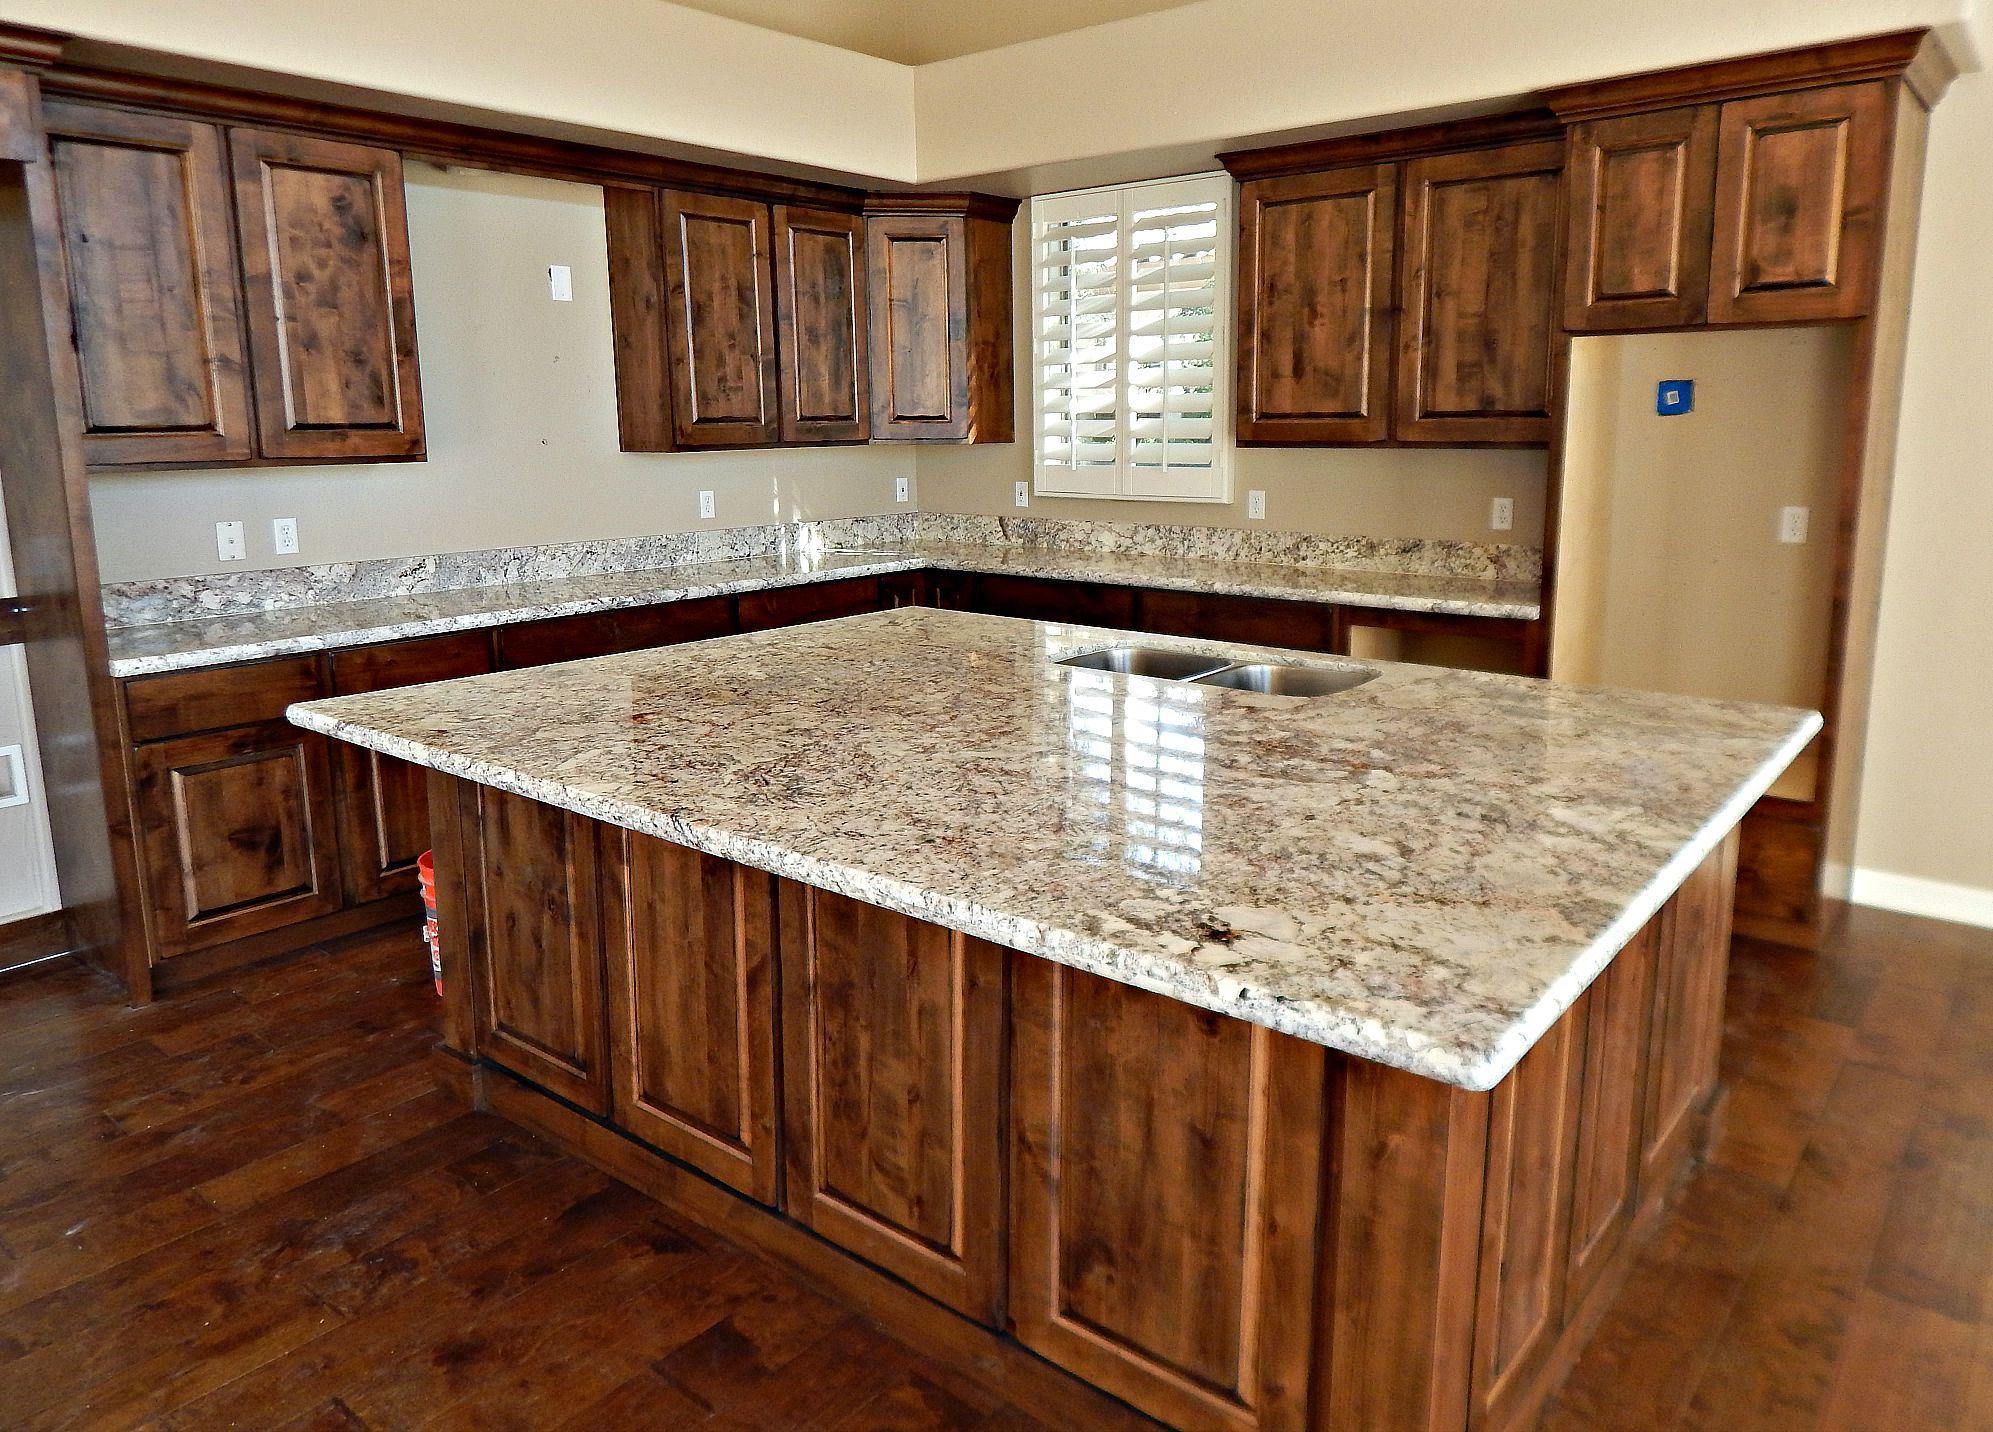 Best White Springs Granite Countertop Remodel With Half Moon 400 x 300